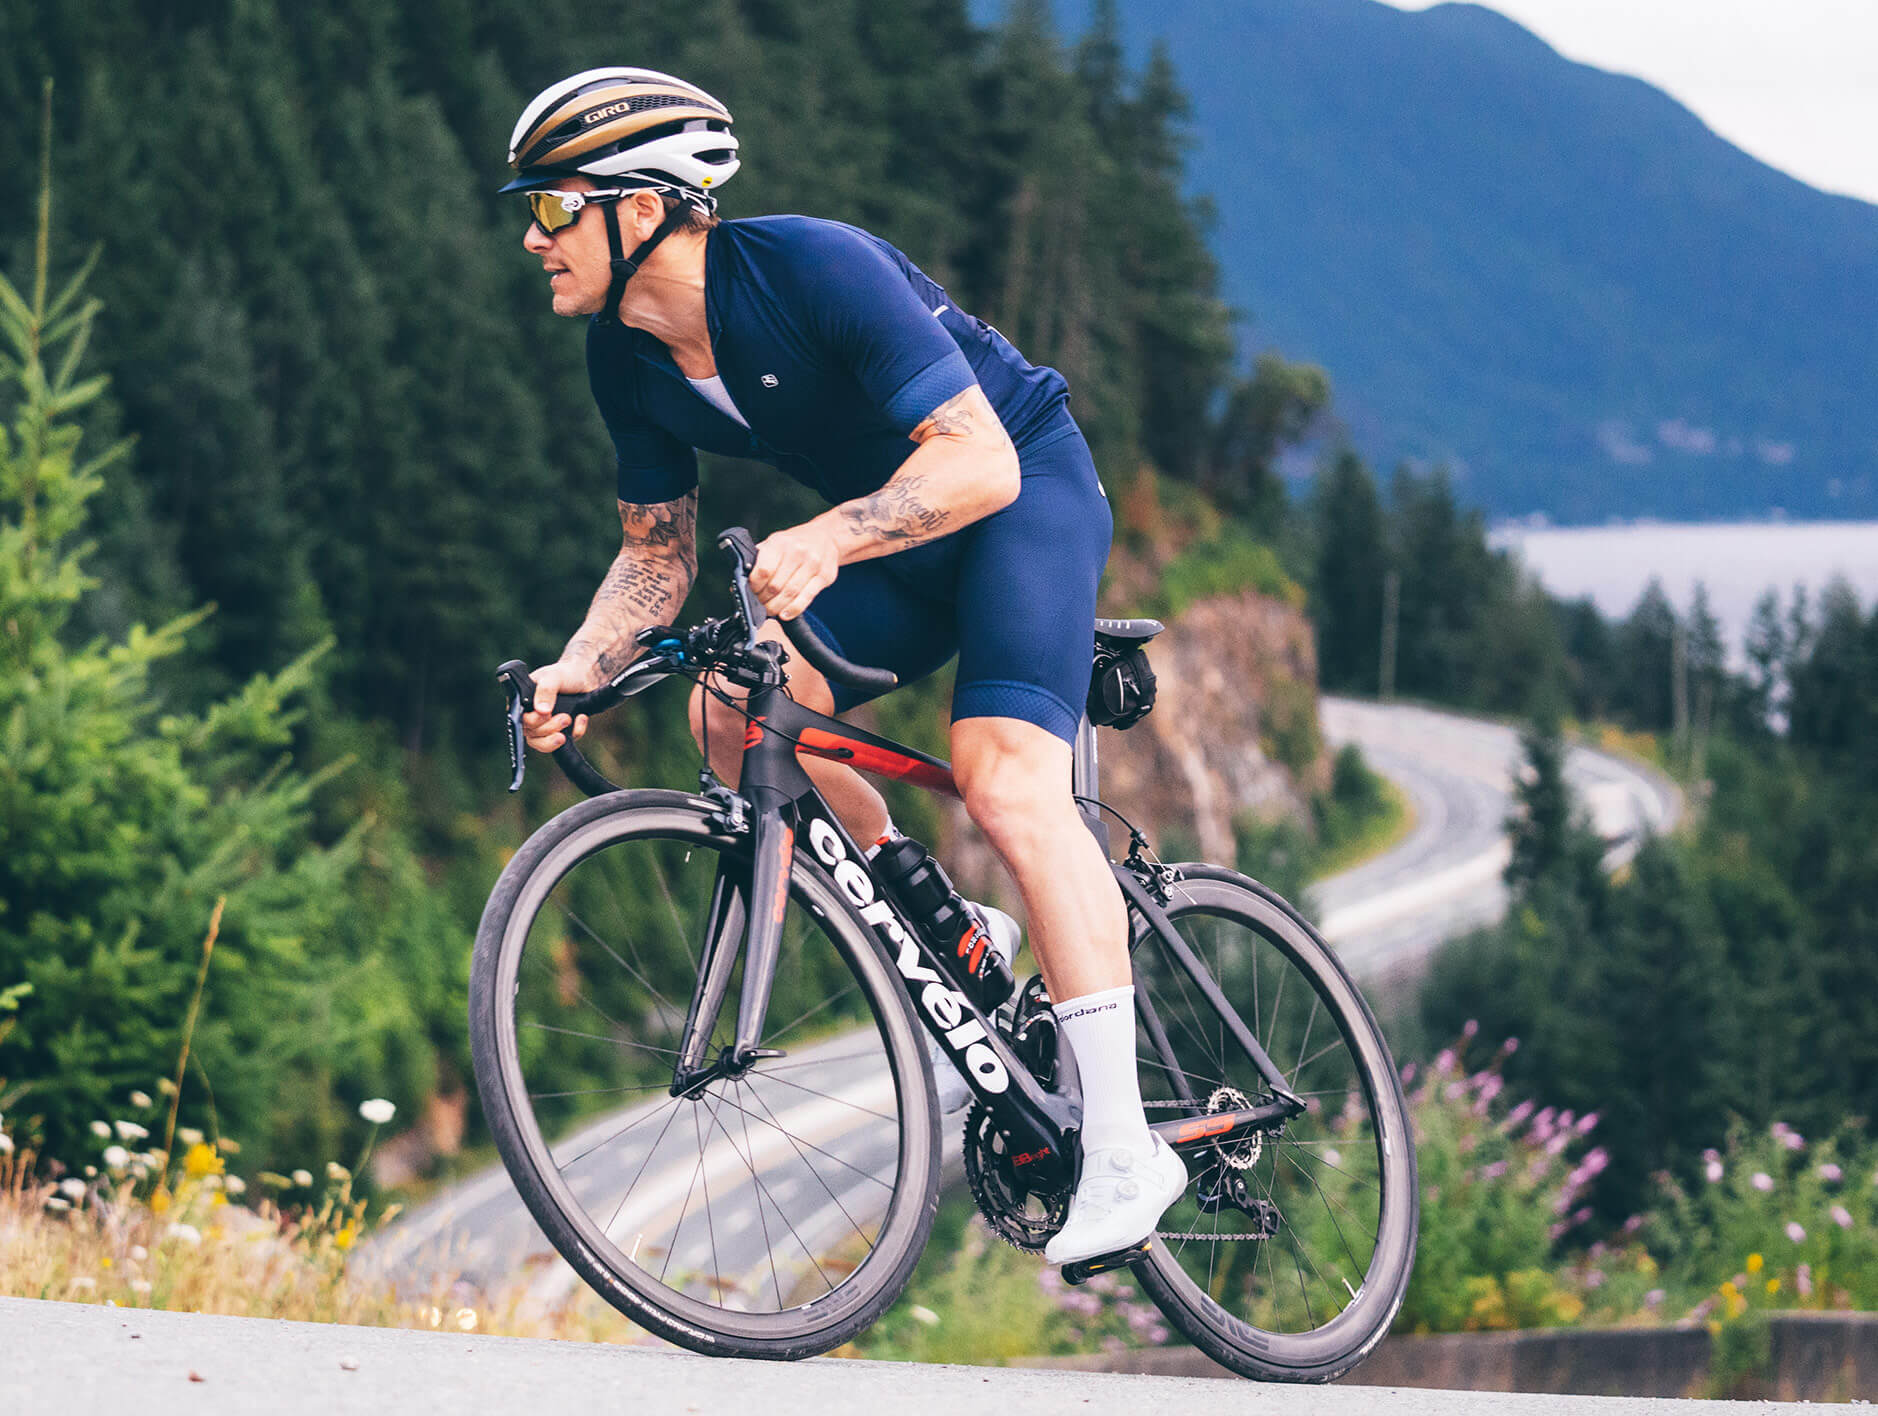 giordana-cycling-bib-short-guide-silverline-square-2